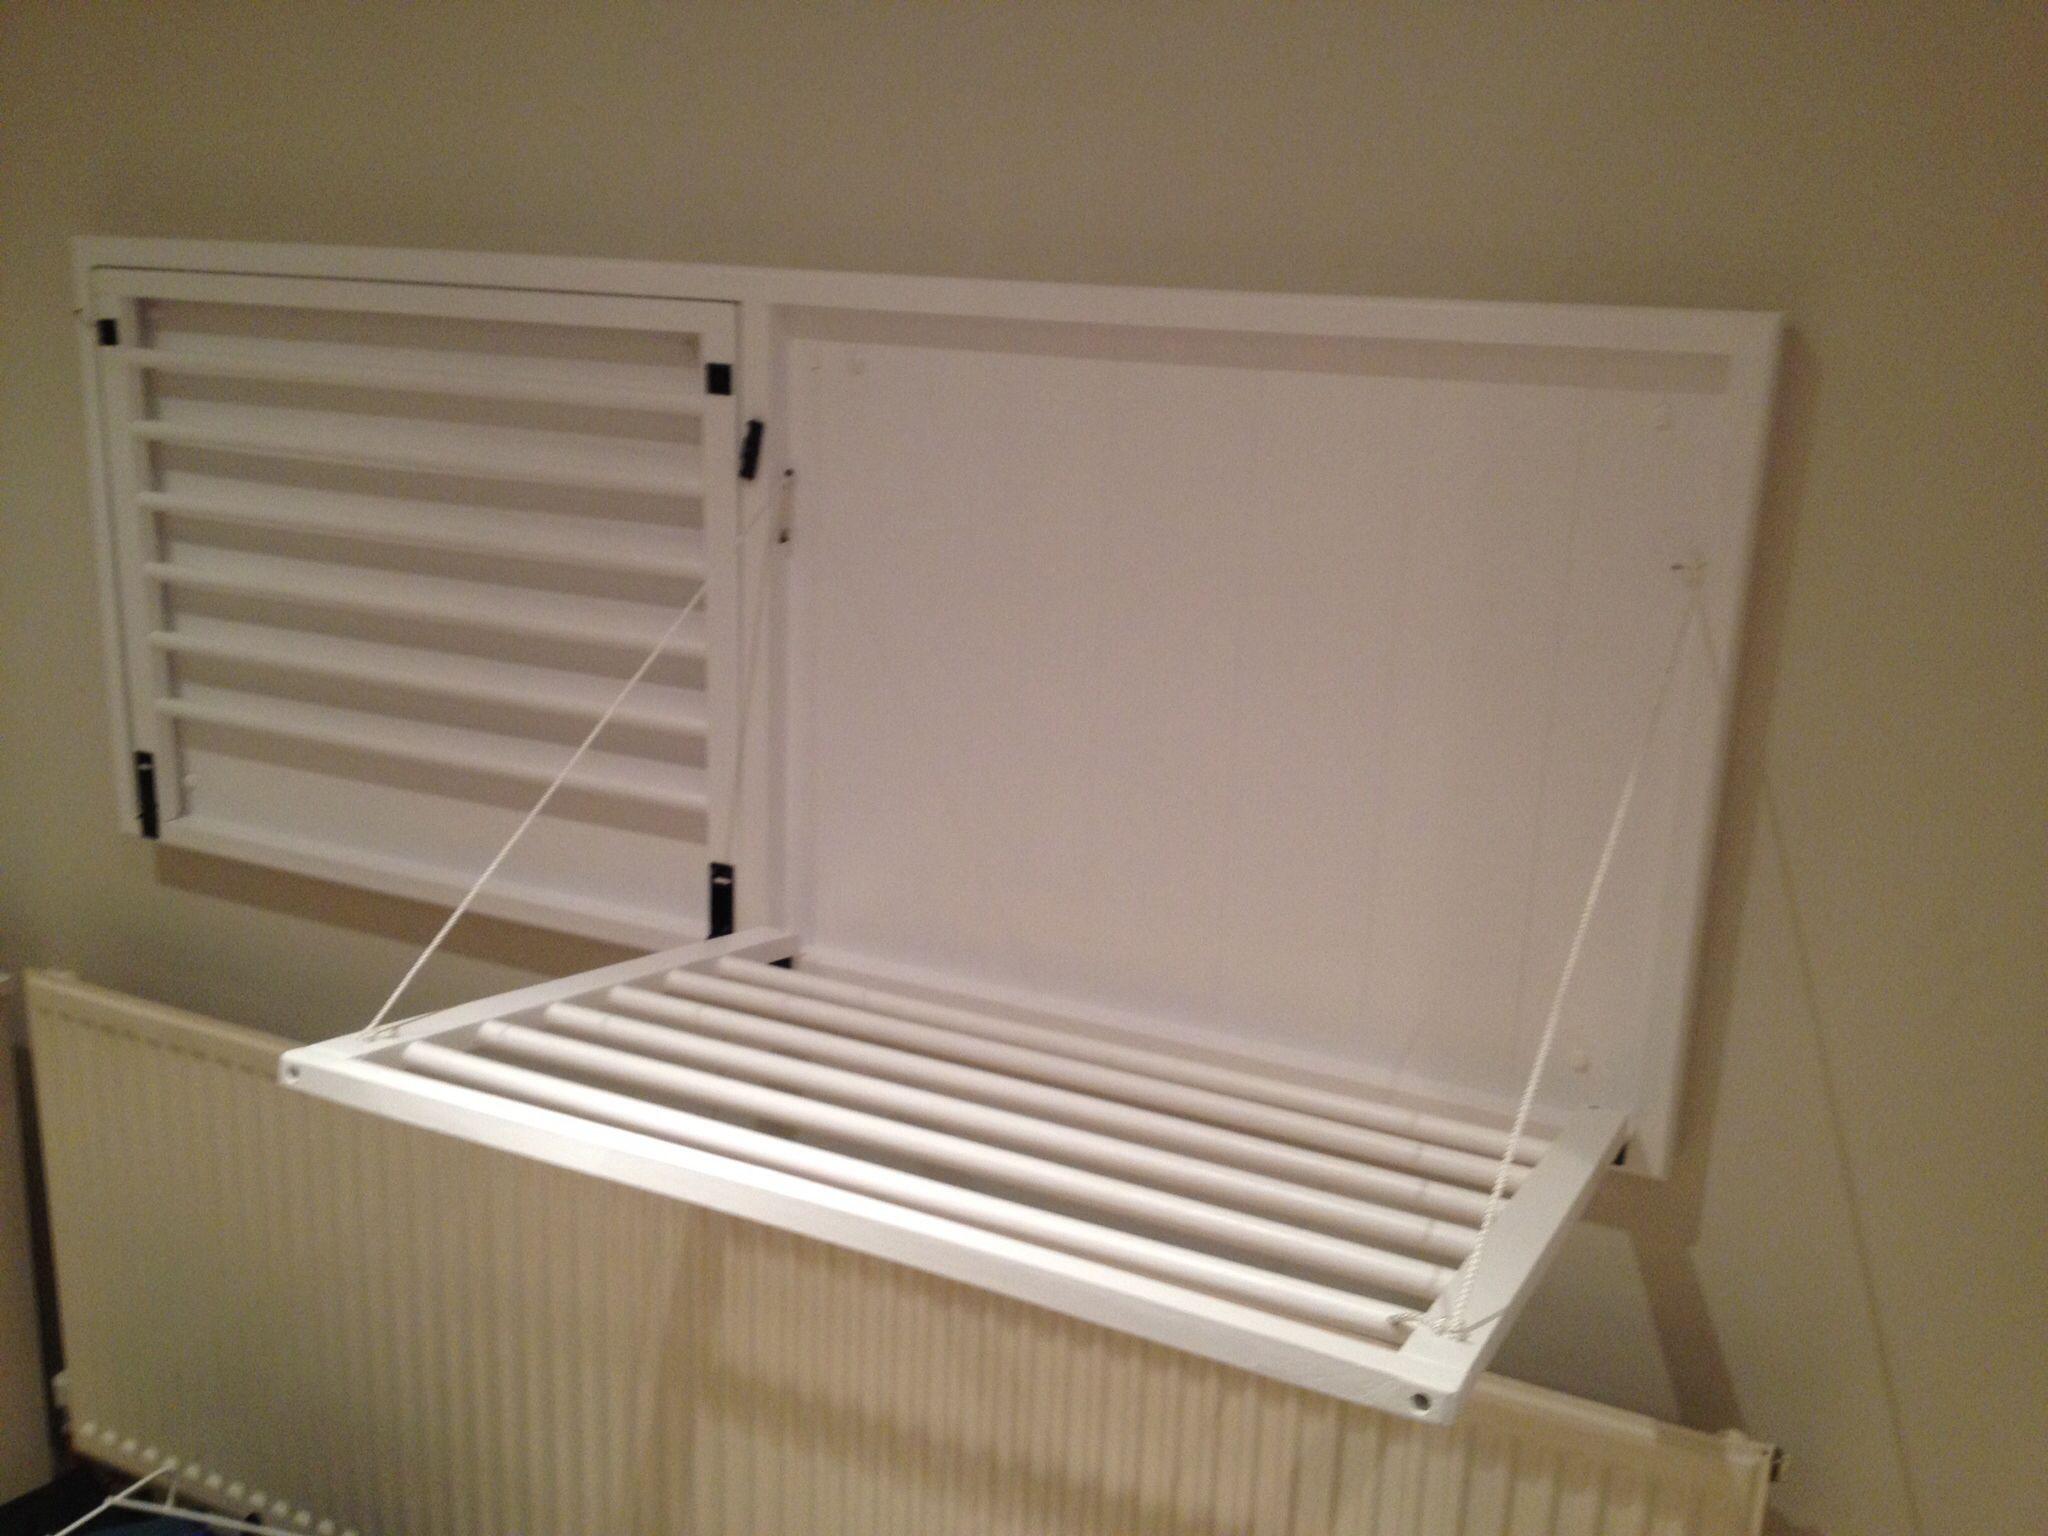 Over radiator drying rack